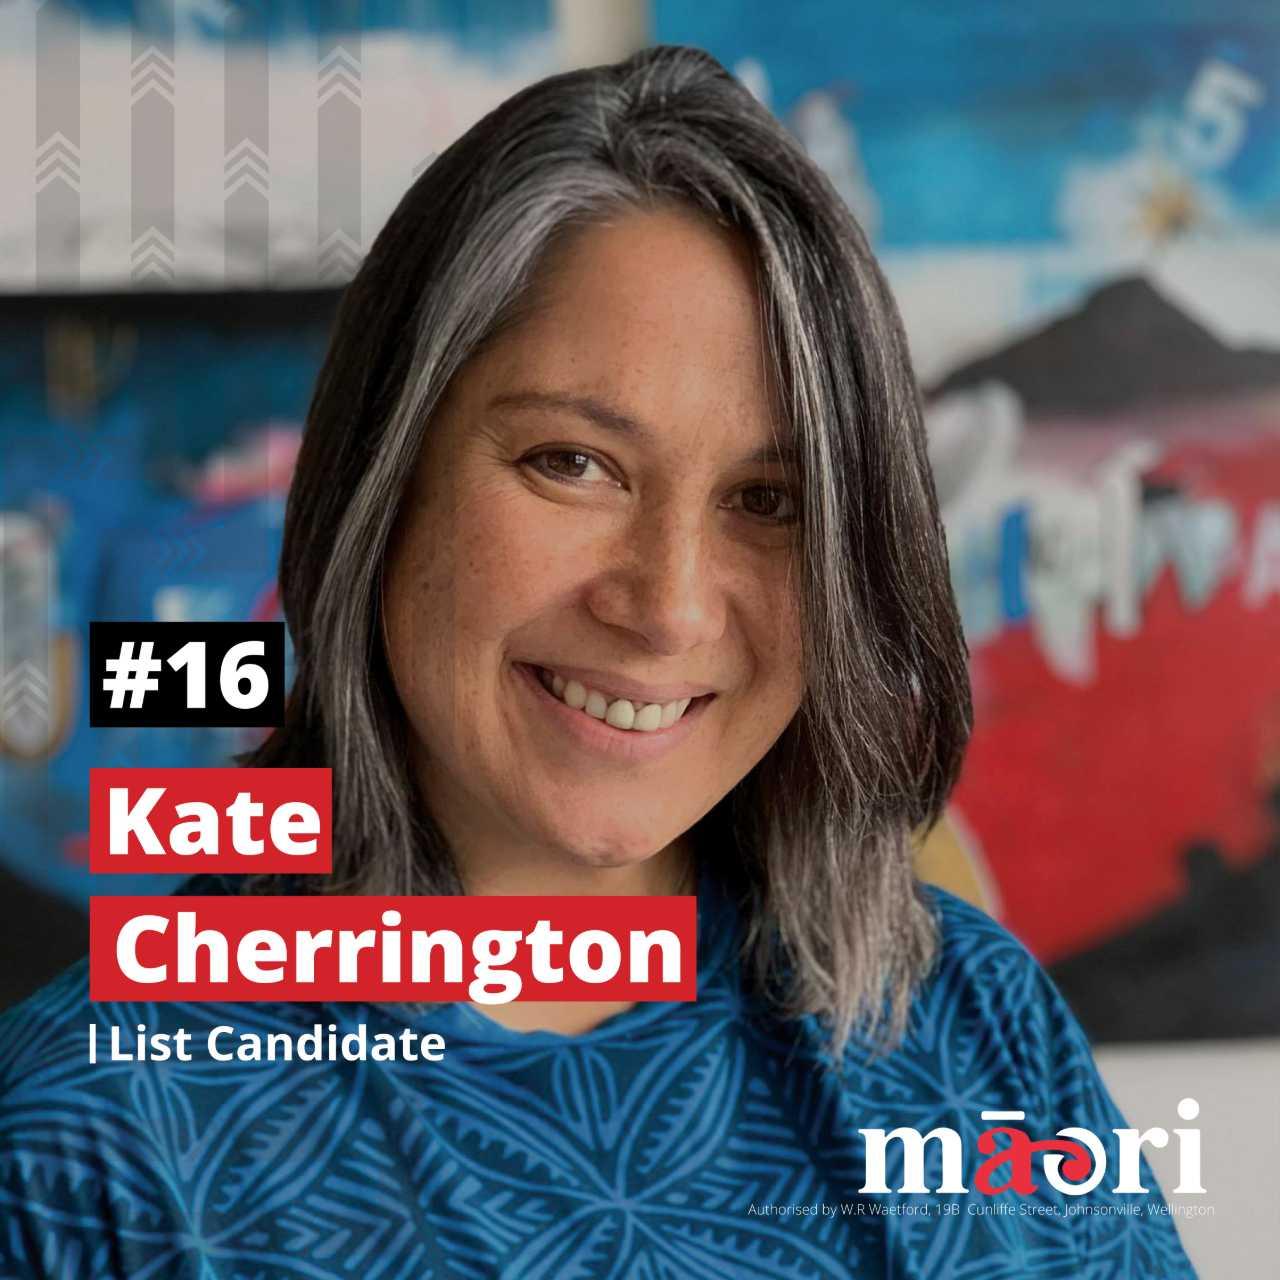 Kate Cherrington, List Candidate